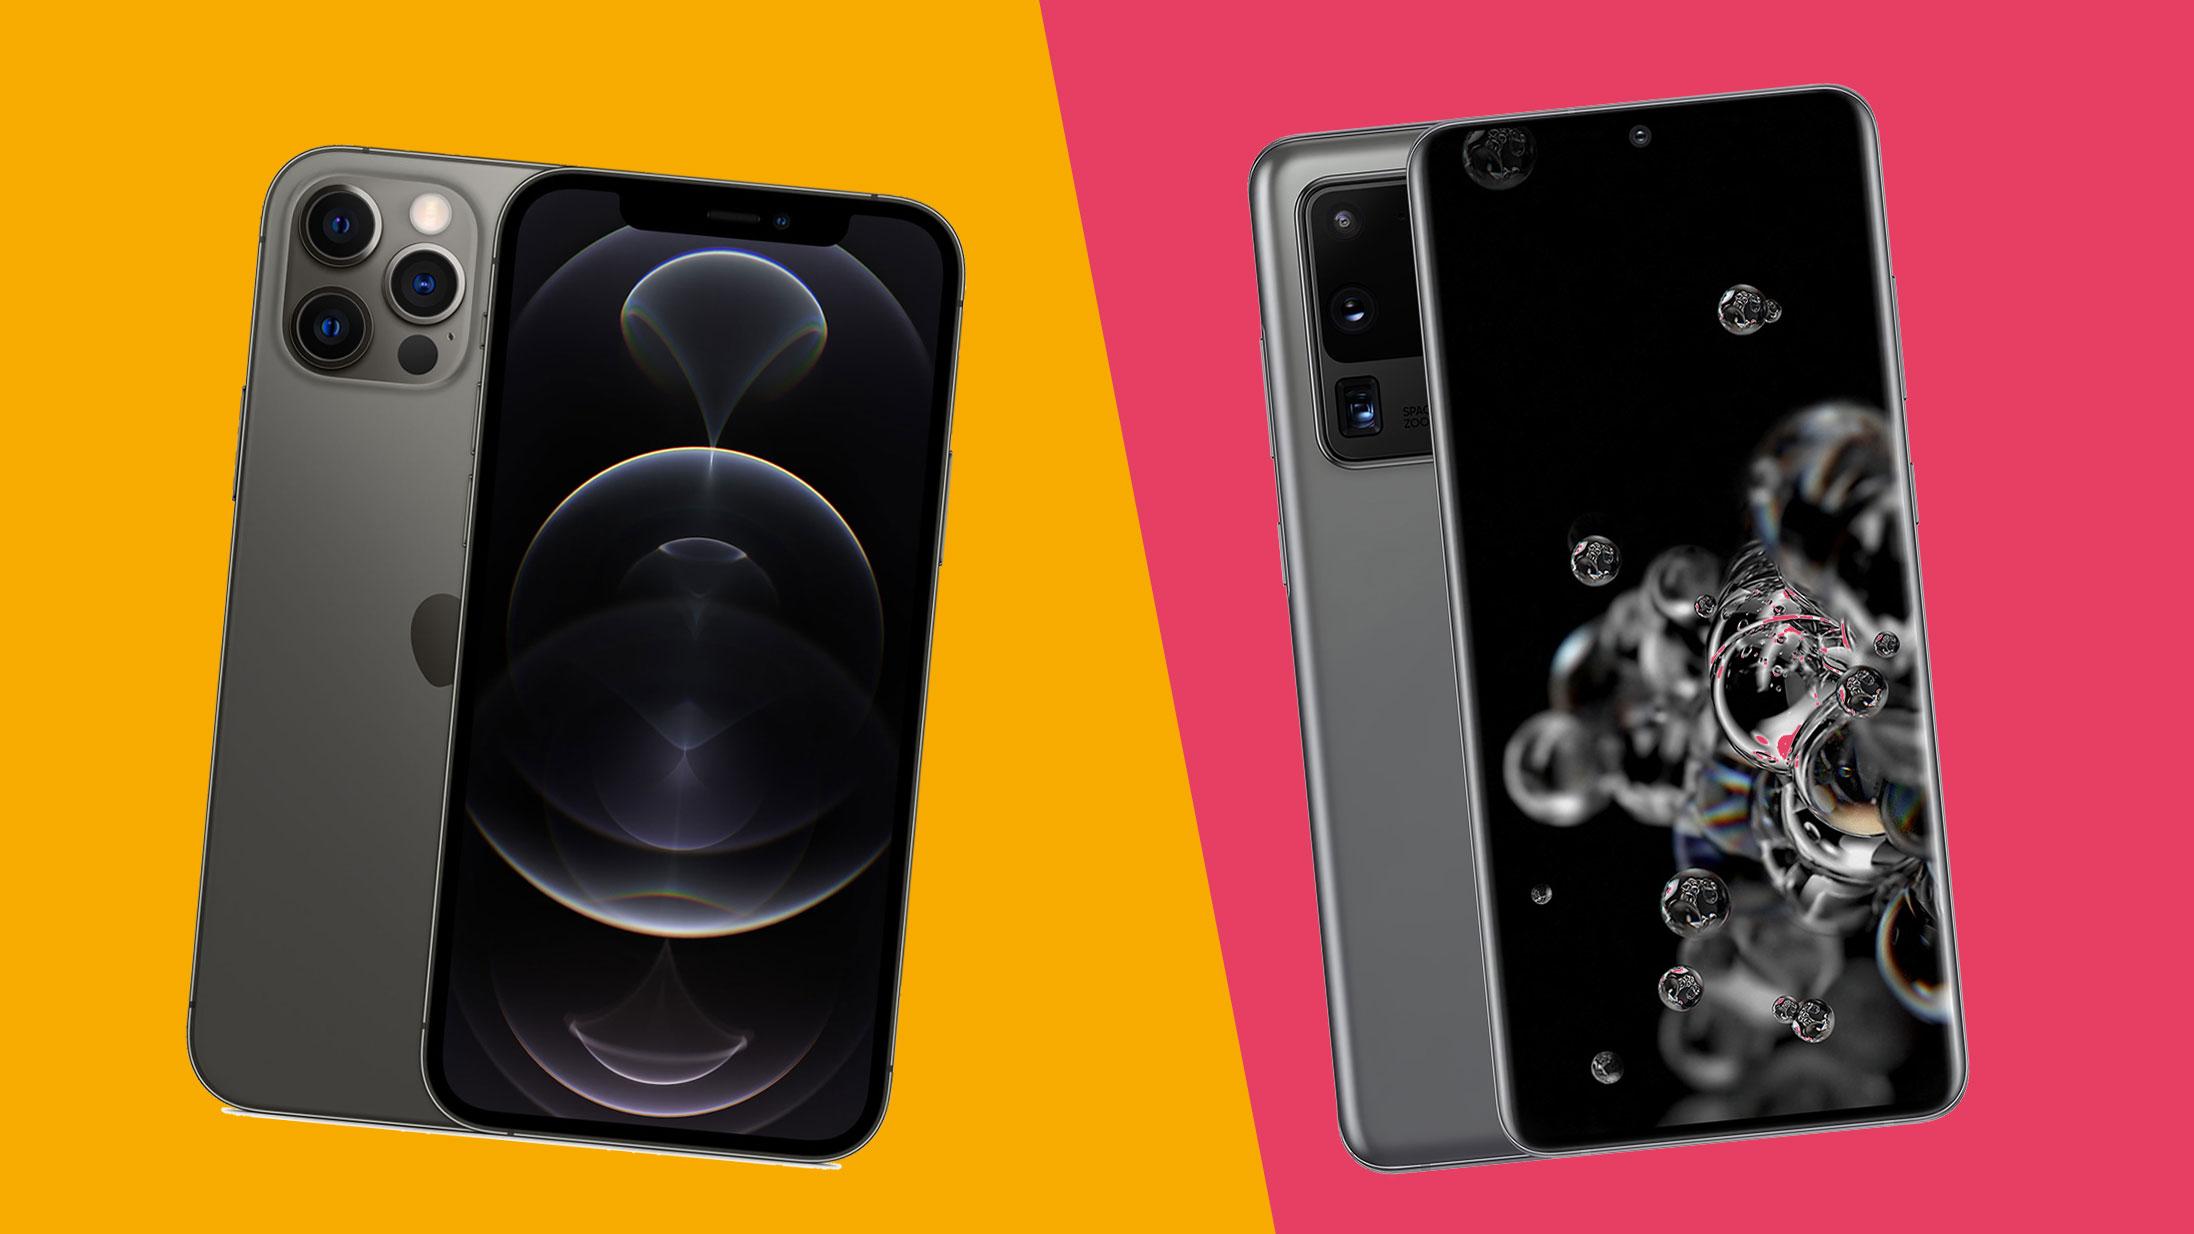 iPhone 12 Pro Max vs Samsung Galaxy S20 Ultra: the ultimate smartphone showdown